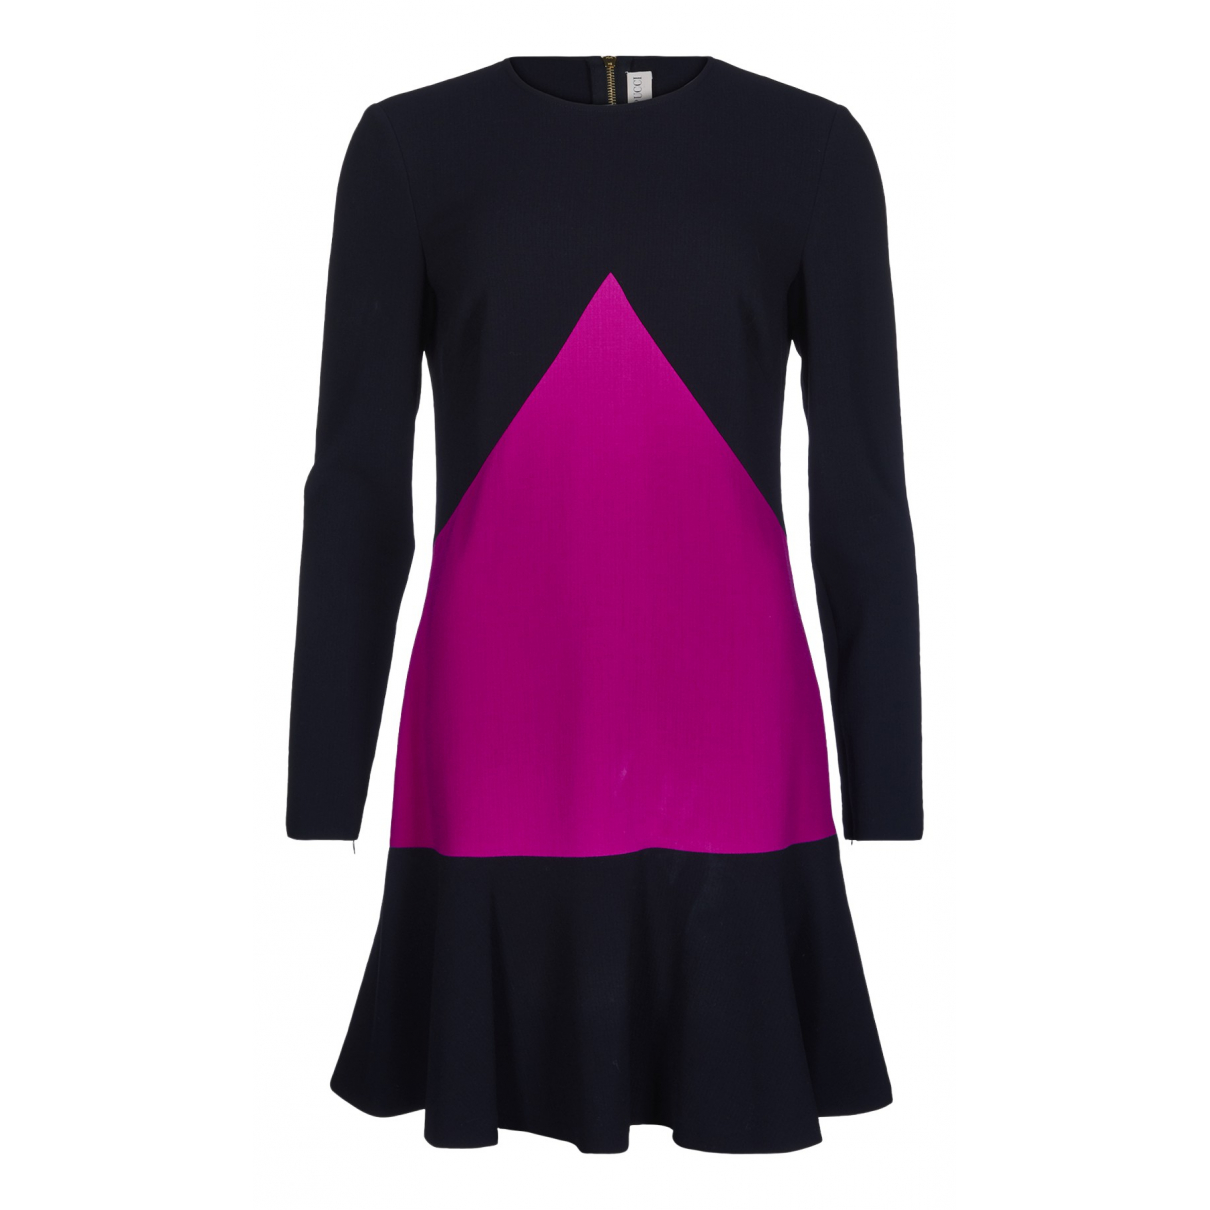 Emilio Pucci \N Kleid in  Bunt Wolle